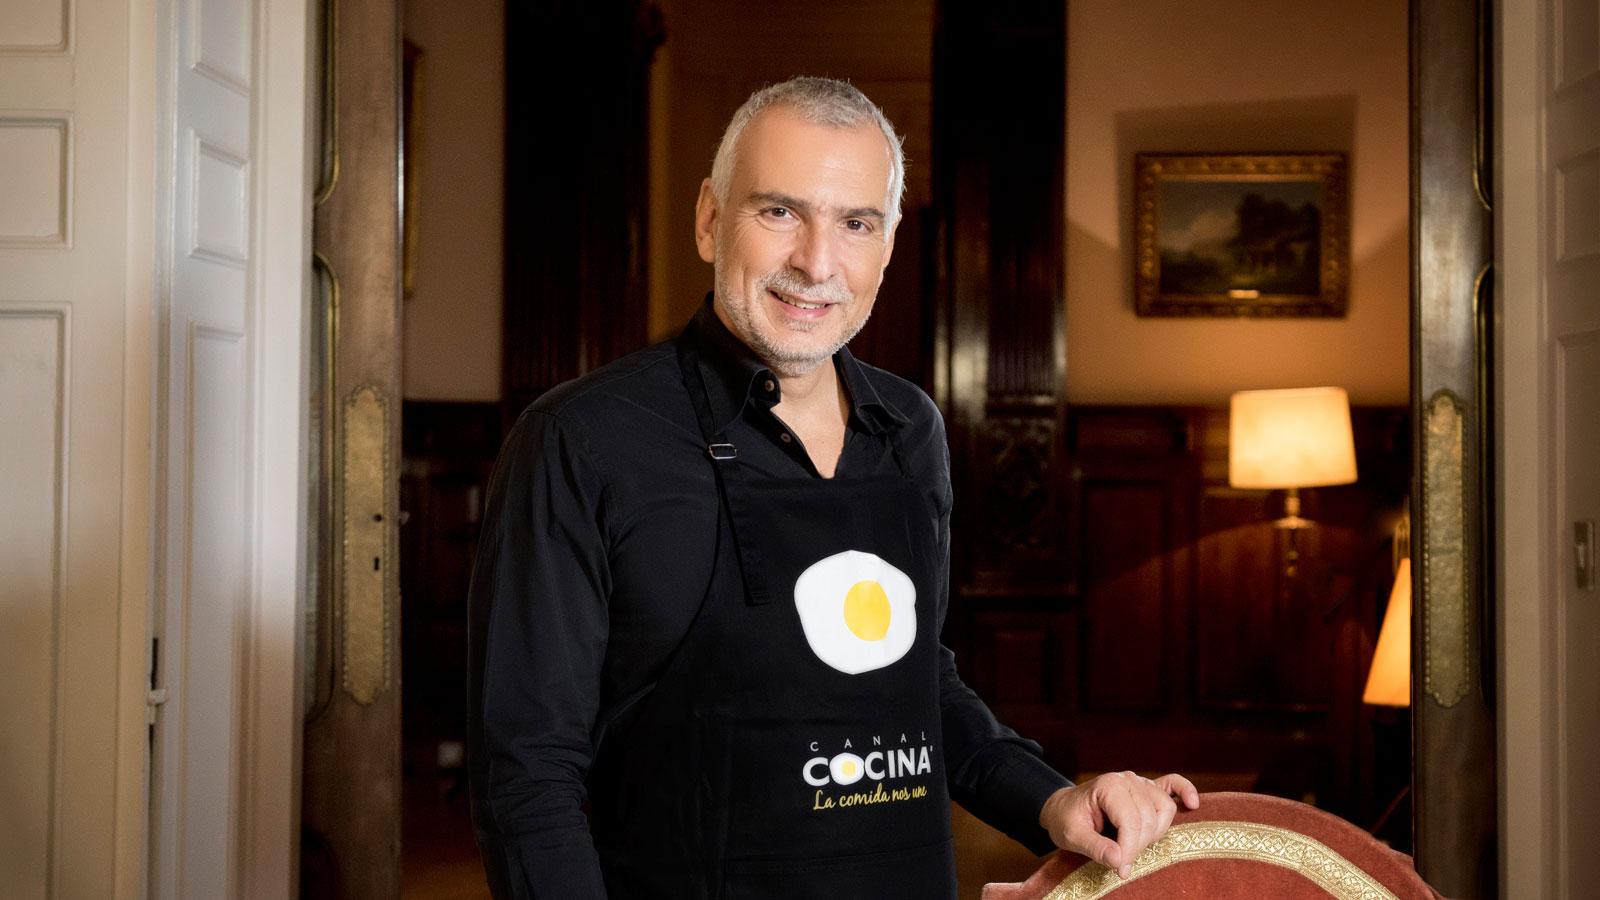 Stefano sannino cocineros canal cocina - Canal cocina cocineros ...